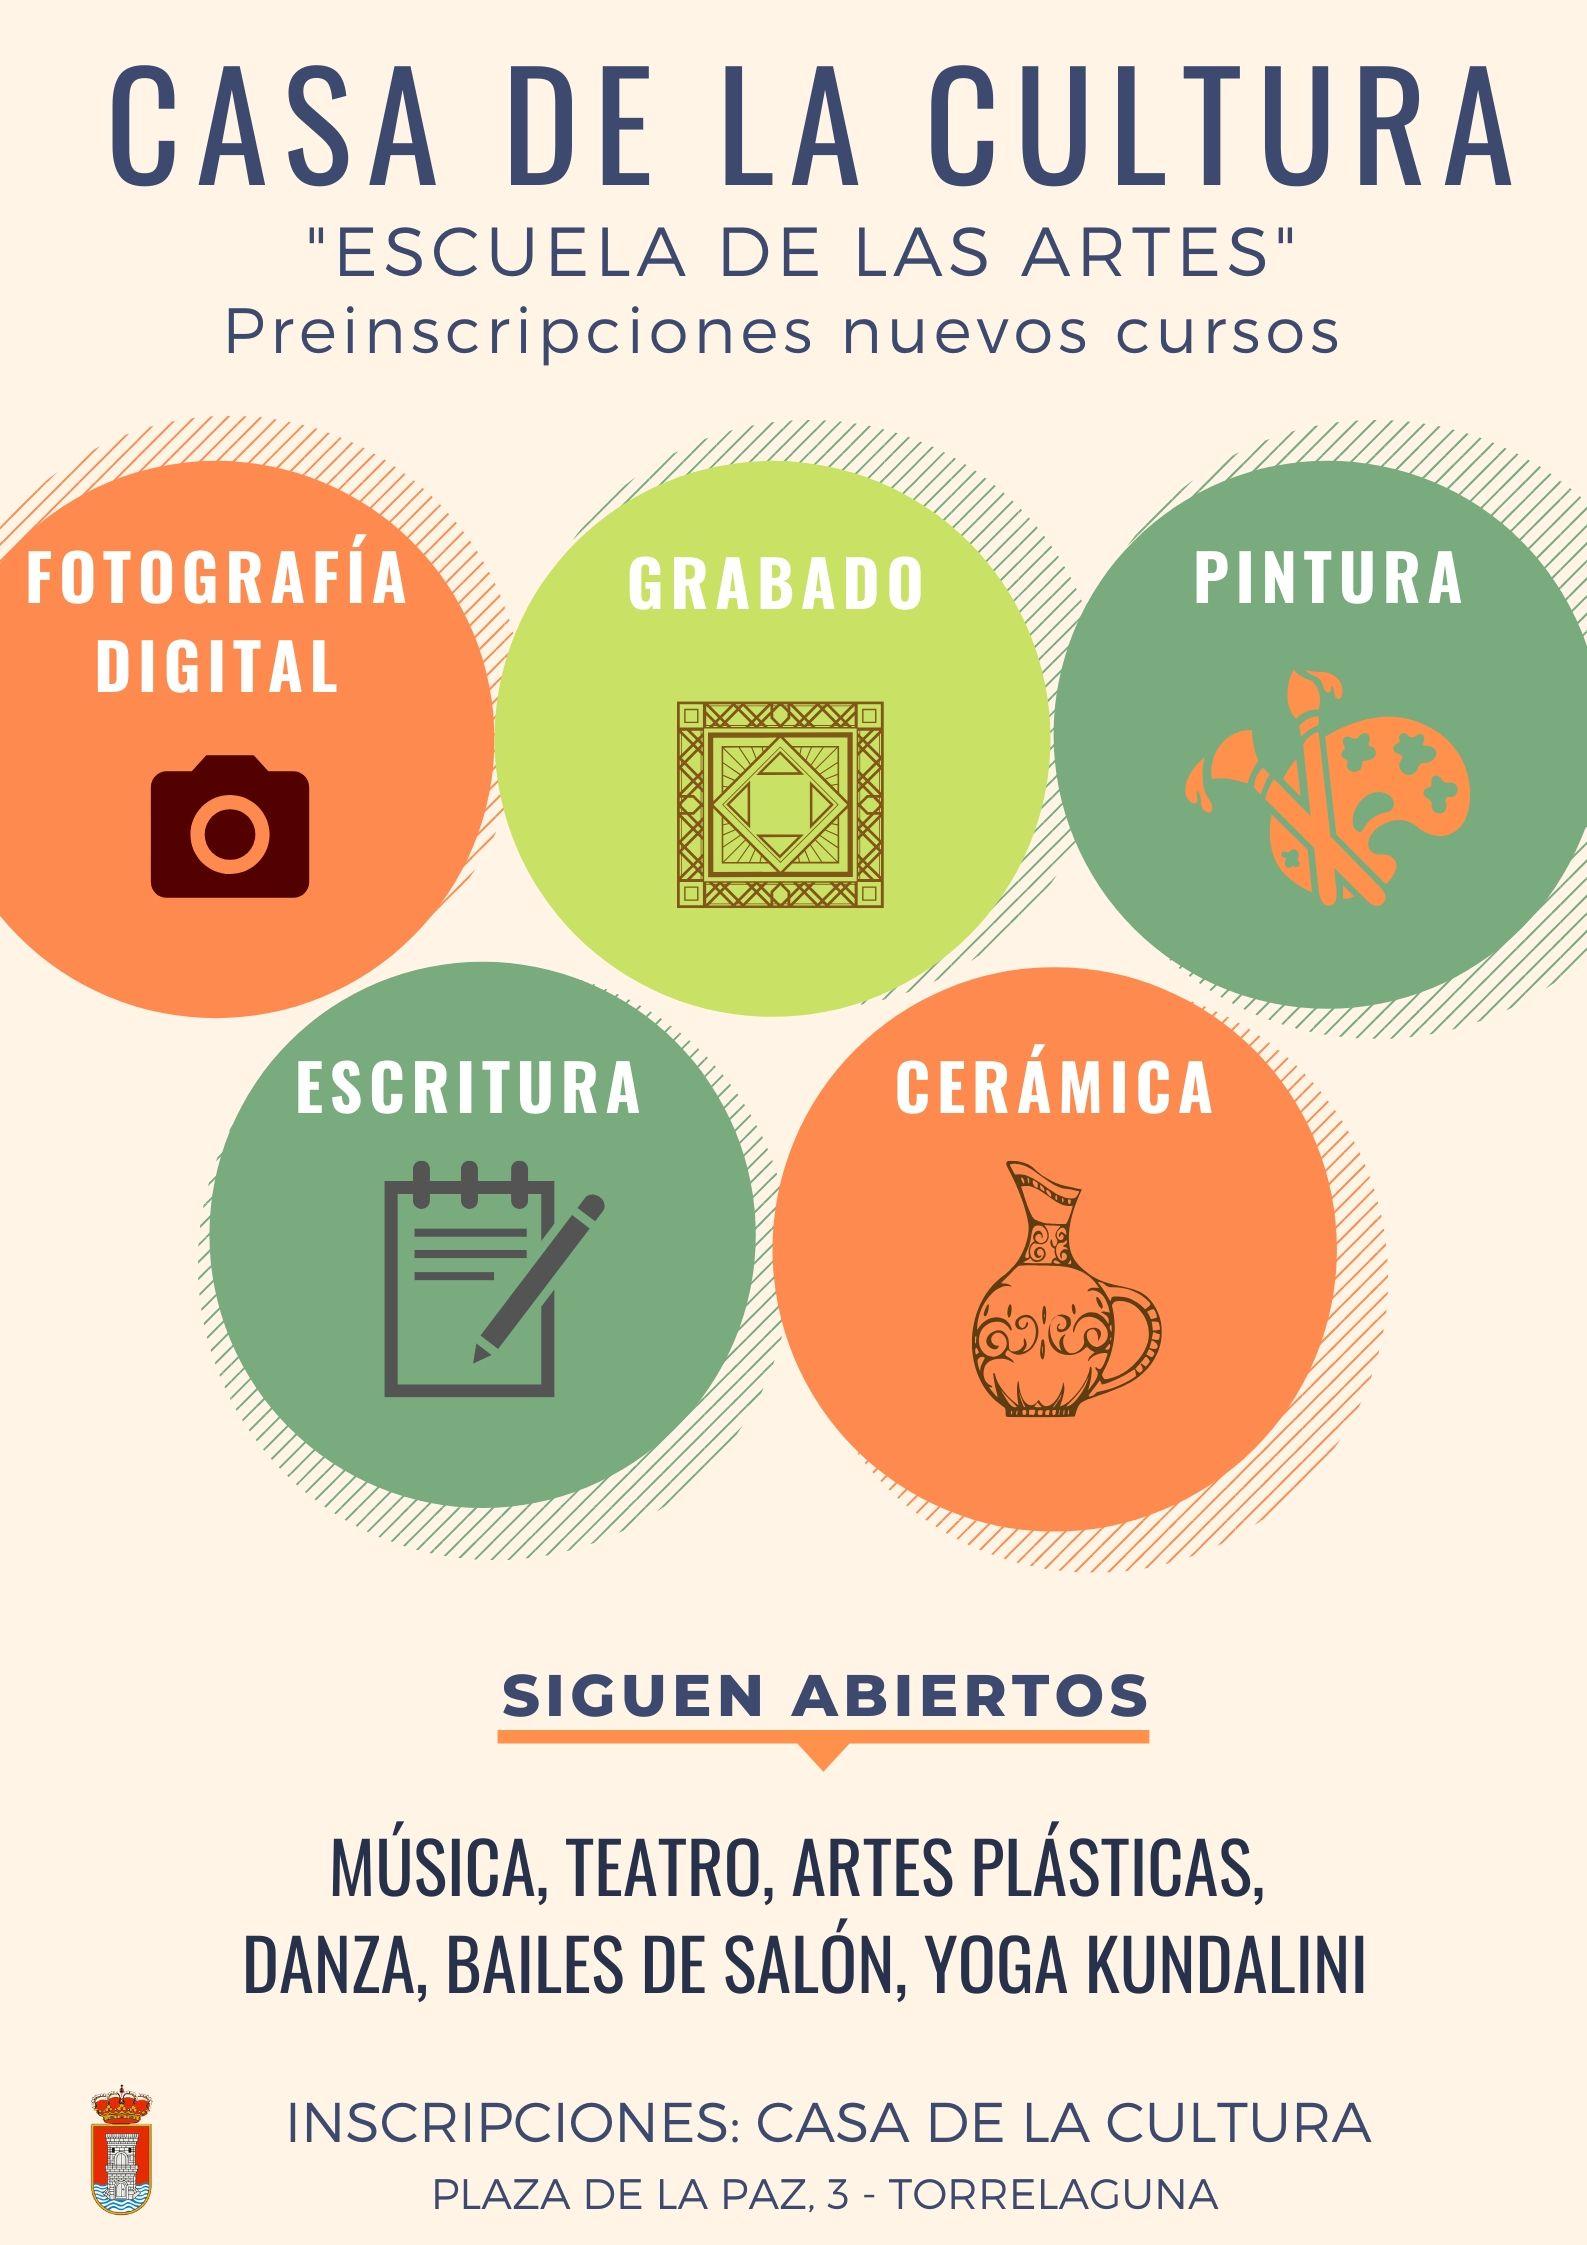 Cursos Escuela de las Artes en Casa de la Cultura de Torrelaguna